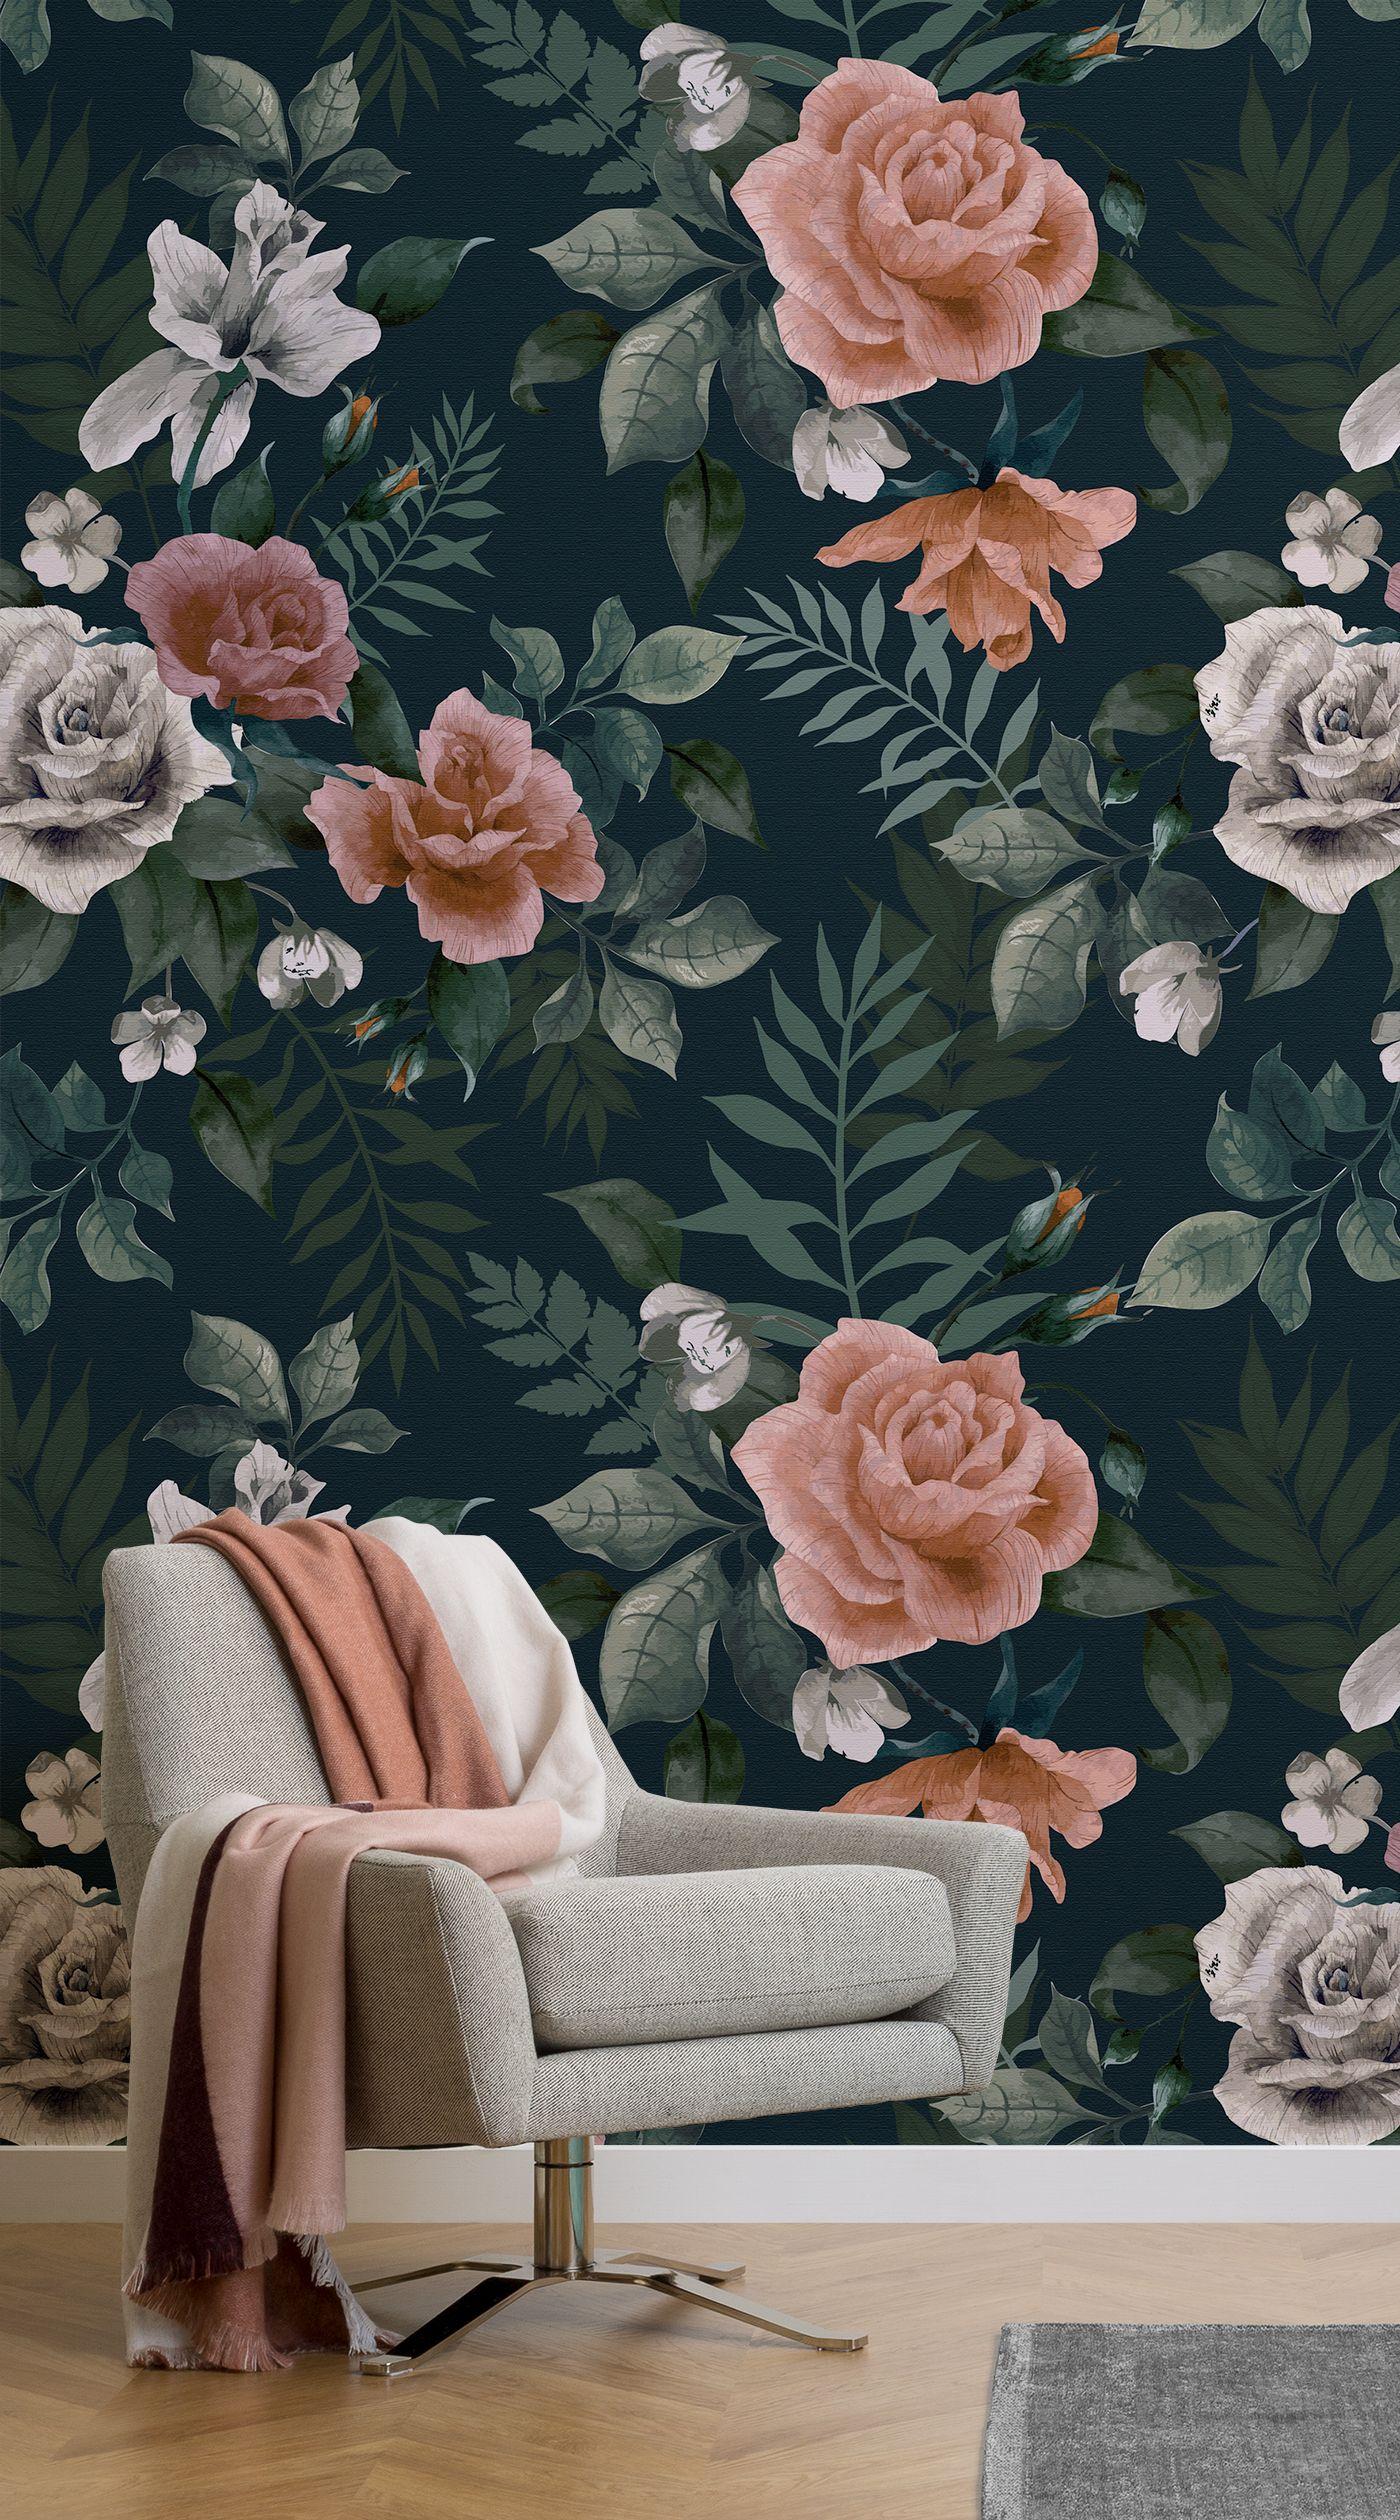 4 Wallpaper Ideas To Create A Glamorous Interior Murals Wallpaper Green Floral Wallpaper Pink Floral Wallpaper Wallpaper Living Room